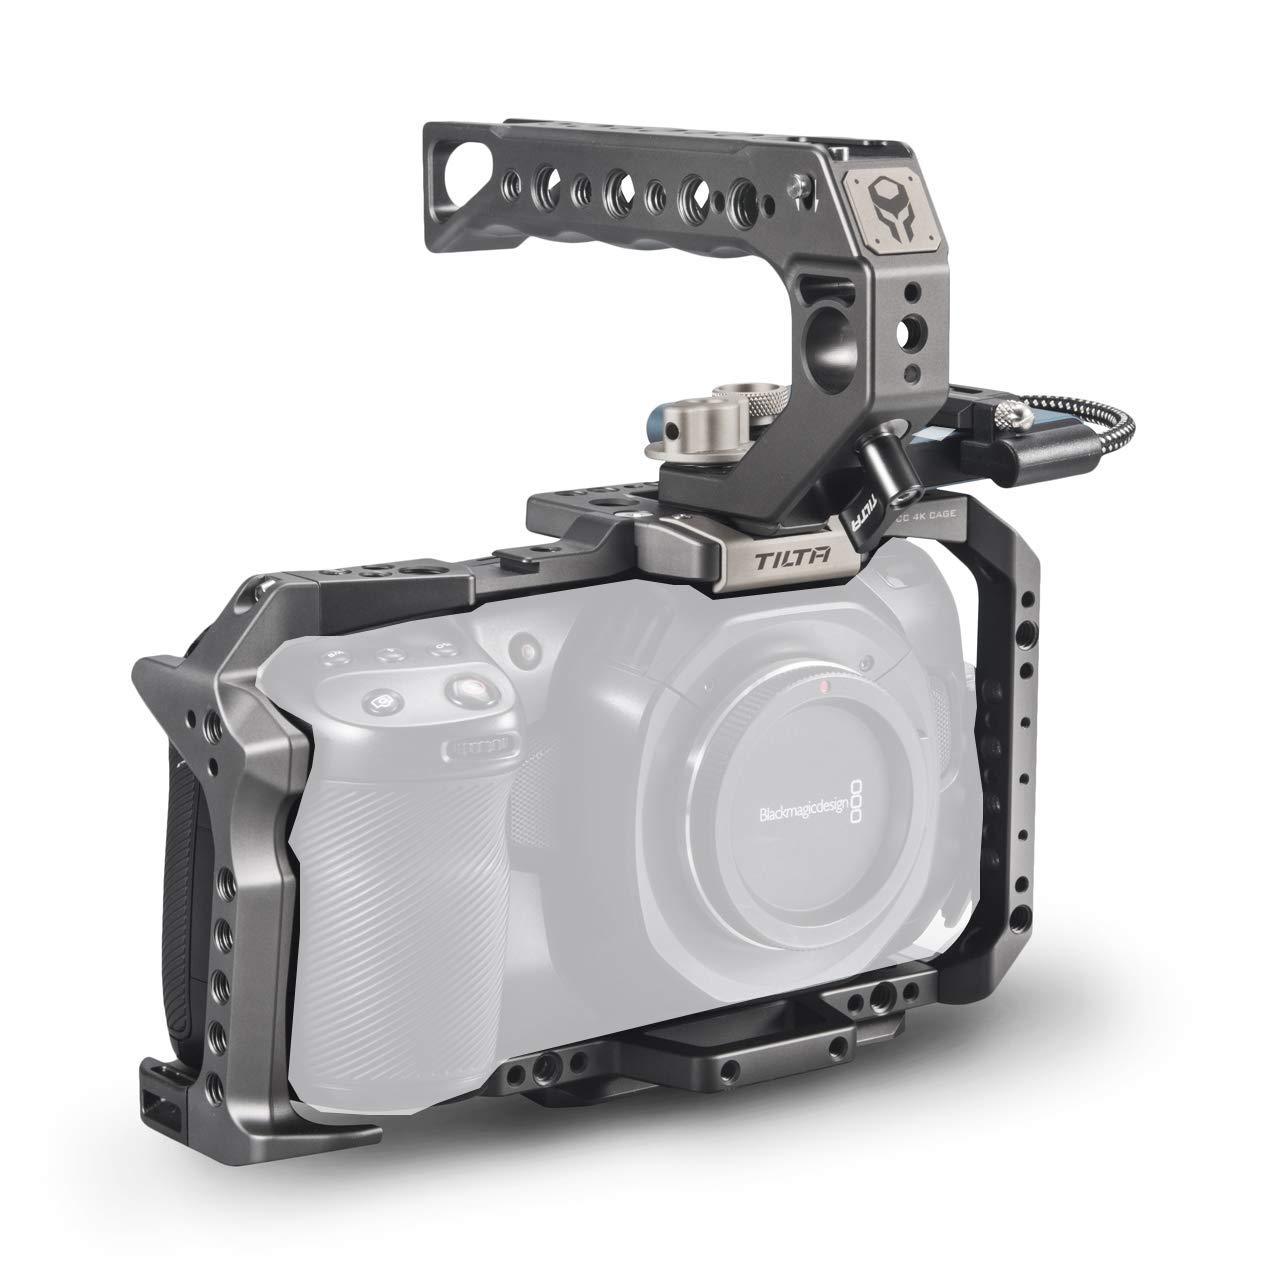 Tilta - Jaula para cámara BMPCC 4K, Color Gris: Amazon.es: Electrónica